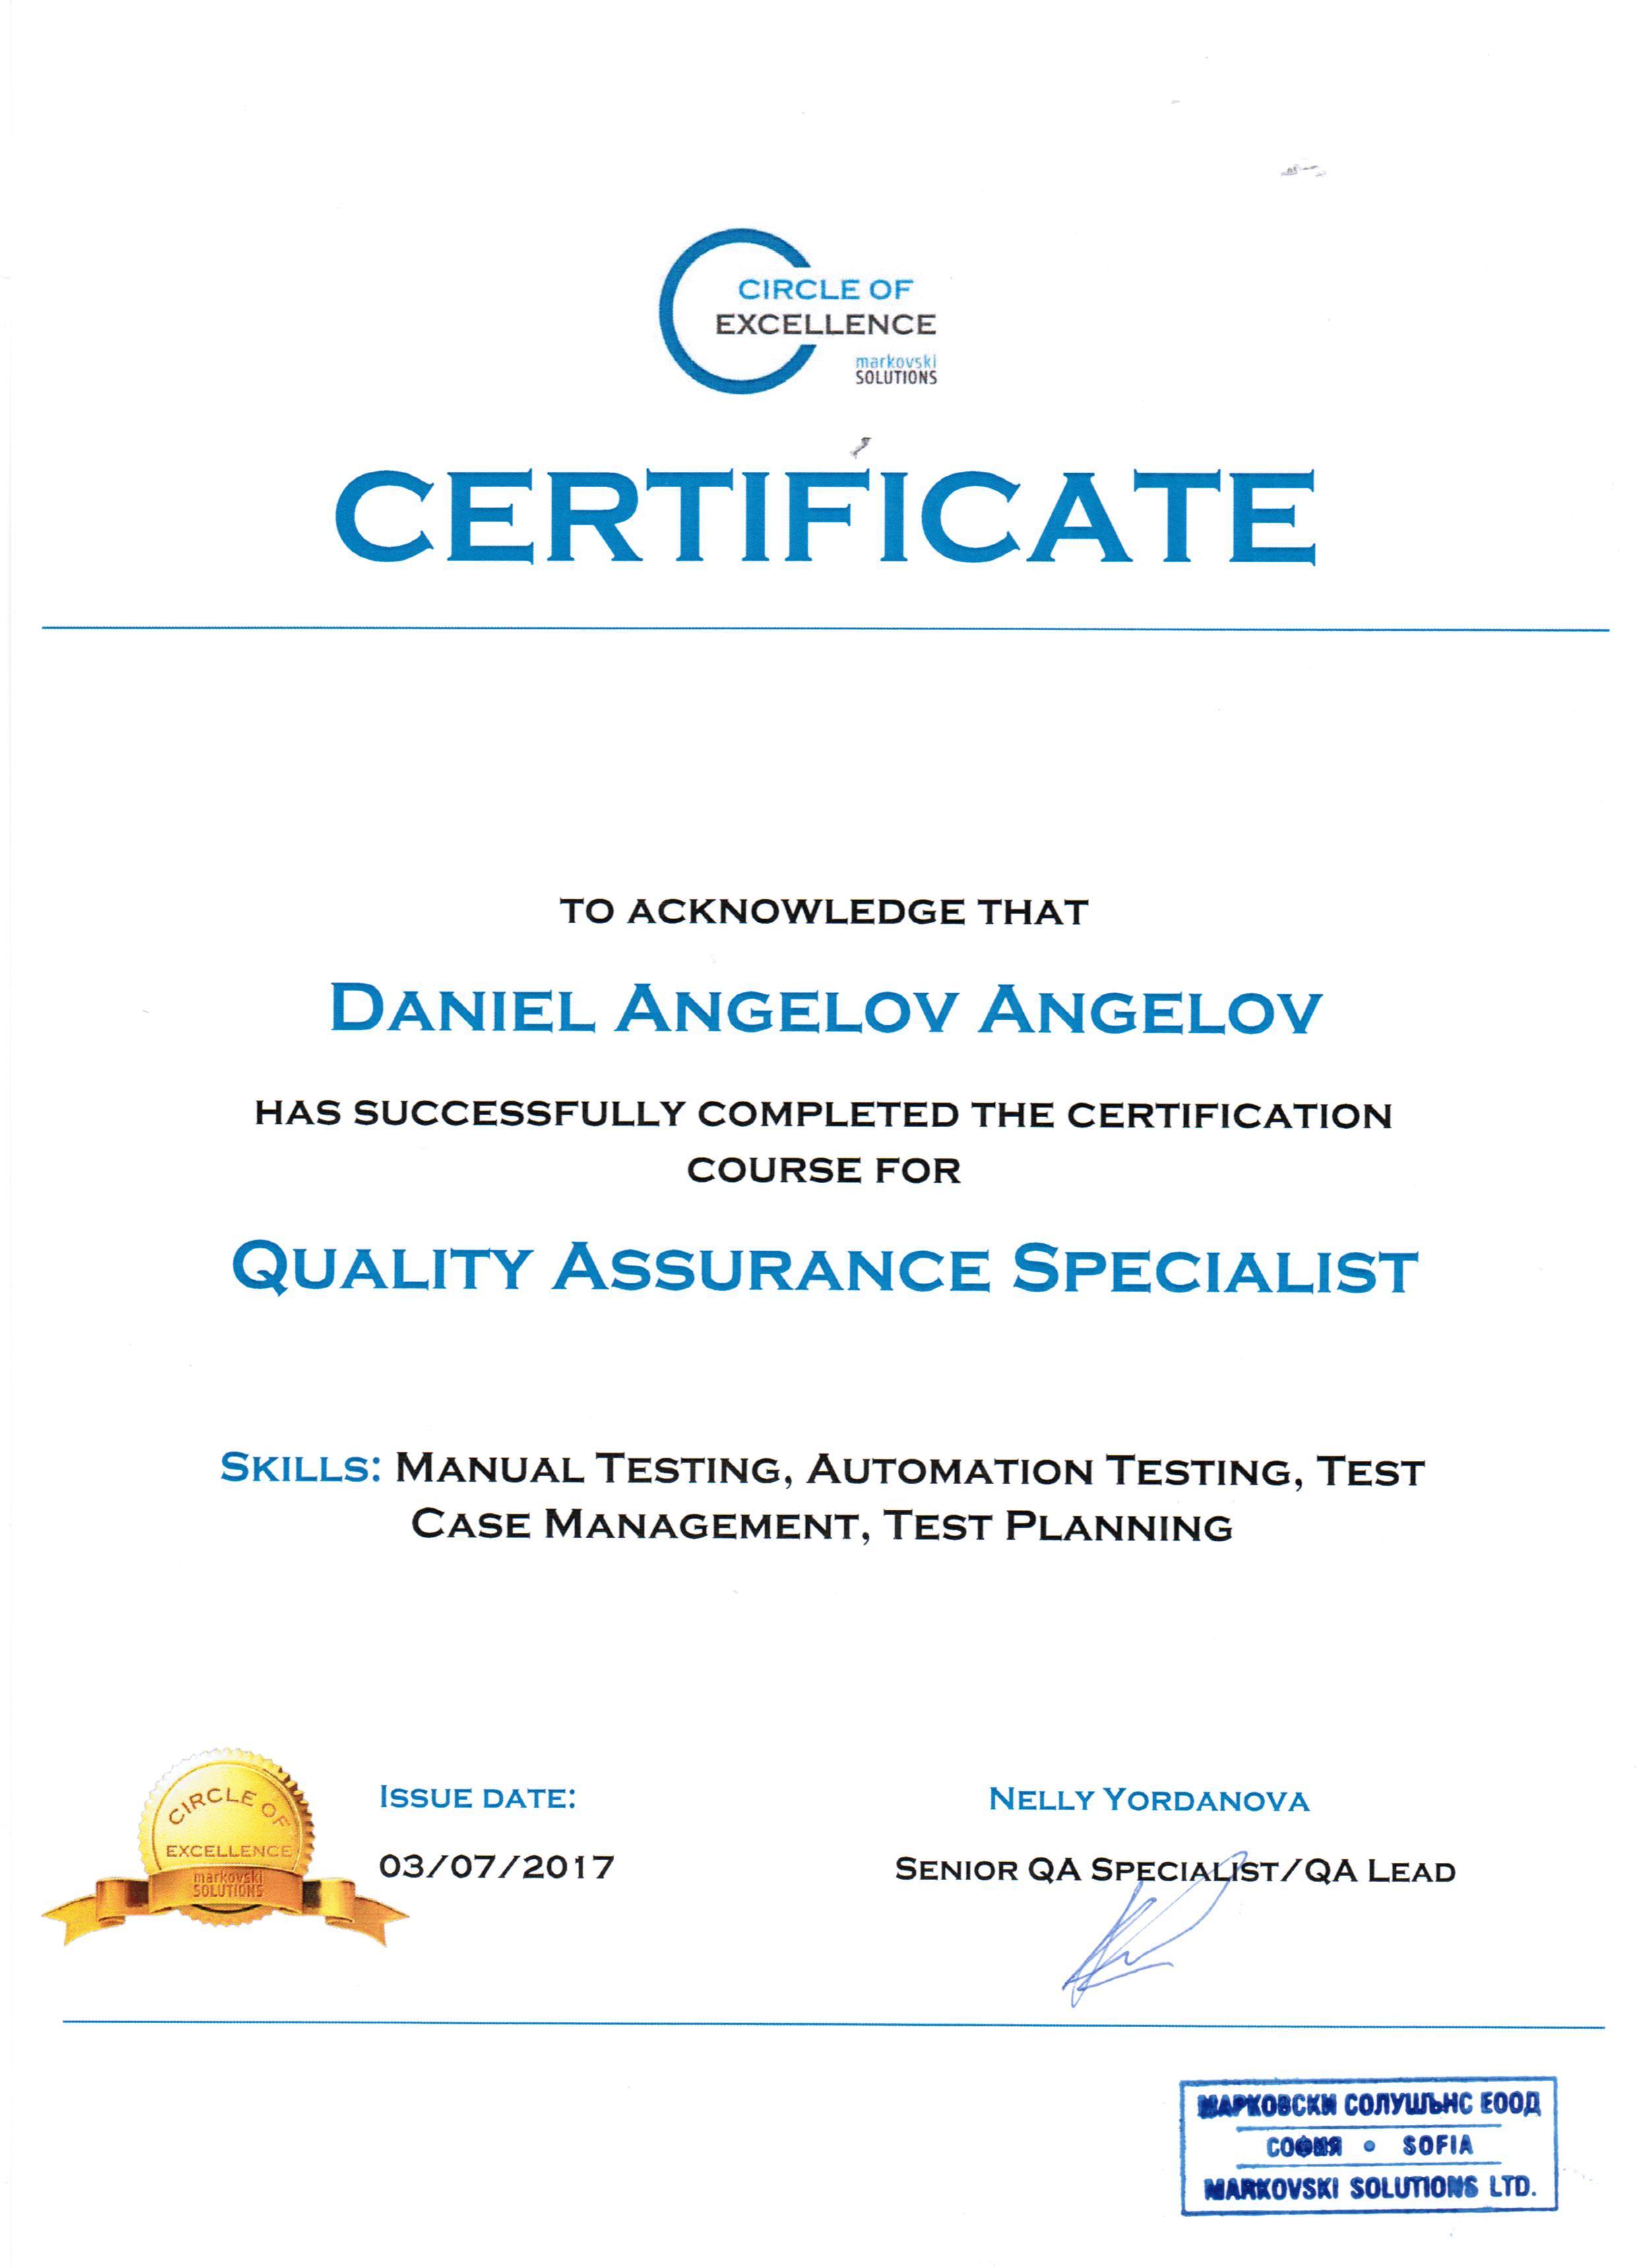 Сертификат на Даниел Ангелов за Quality Assurance Specialist от Markovski Solutions' Circle of Excellence